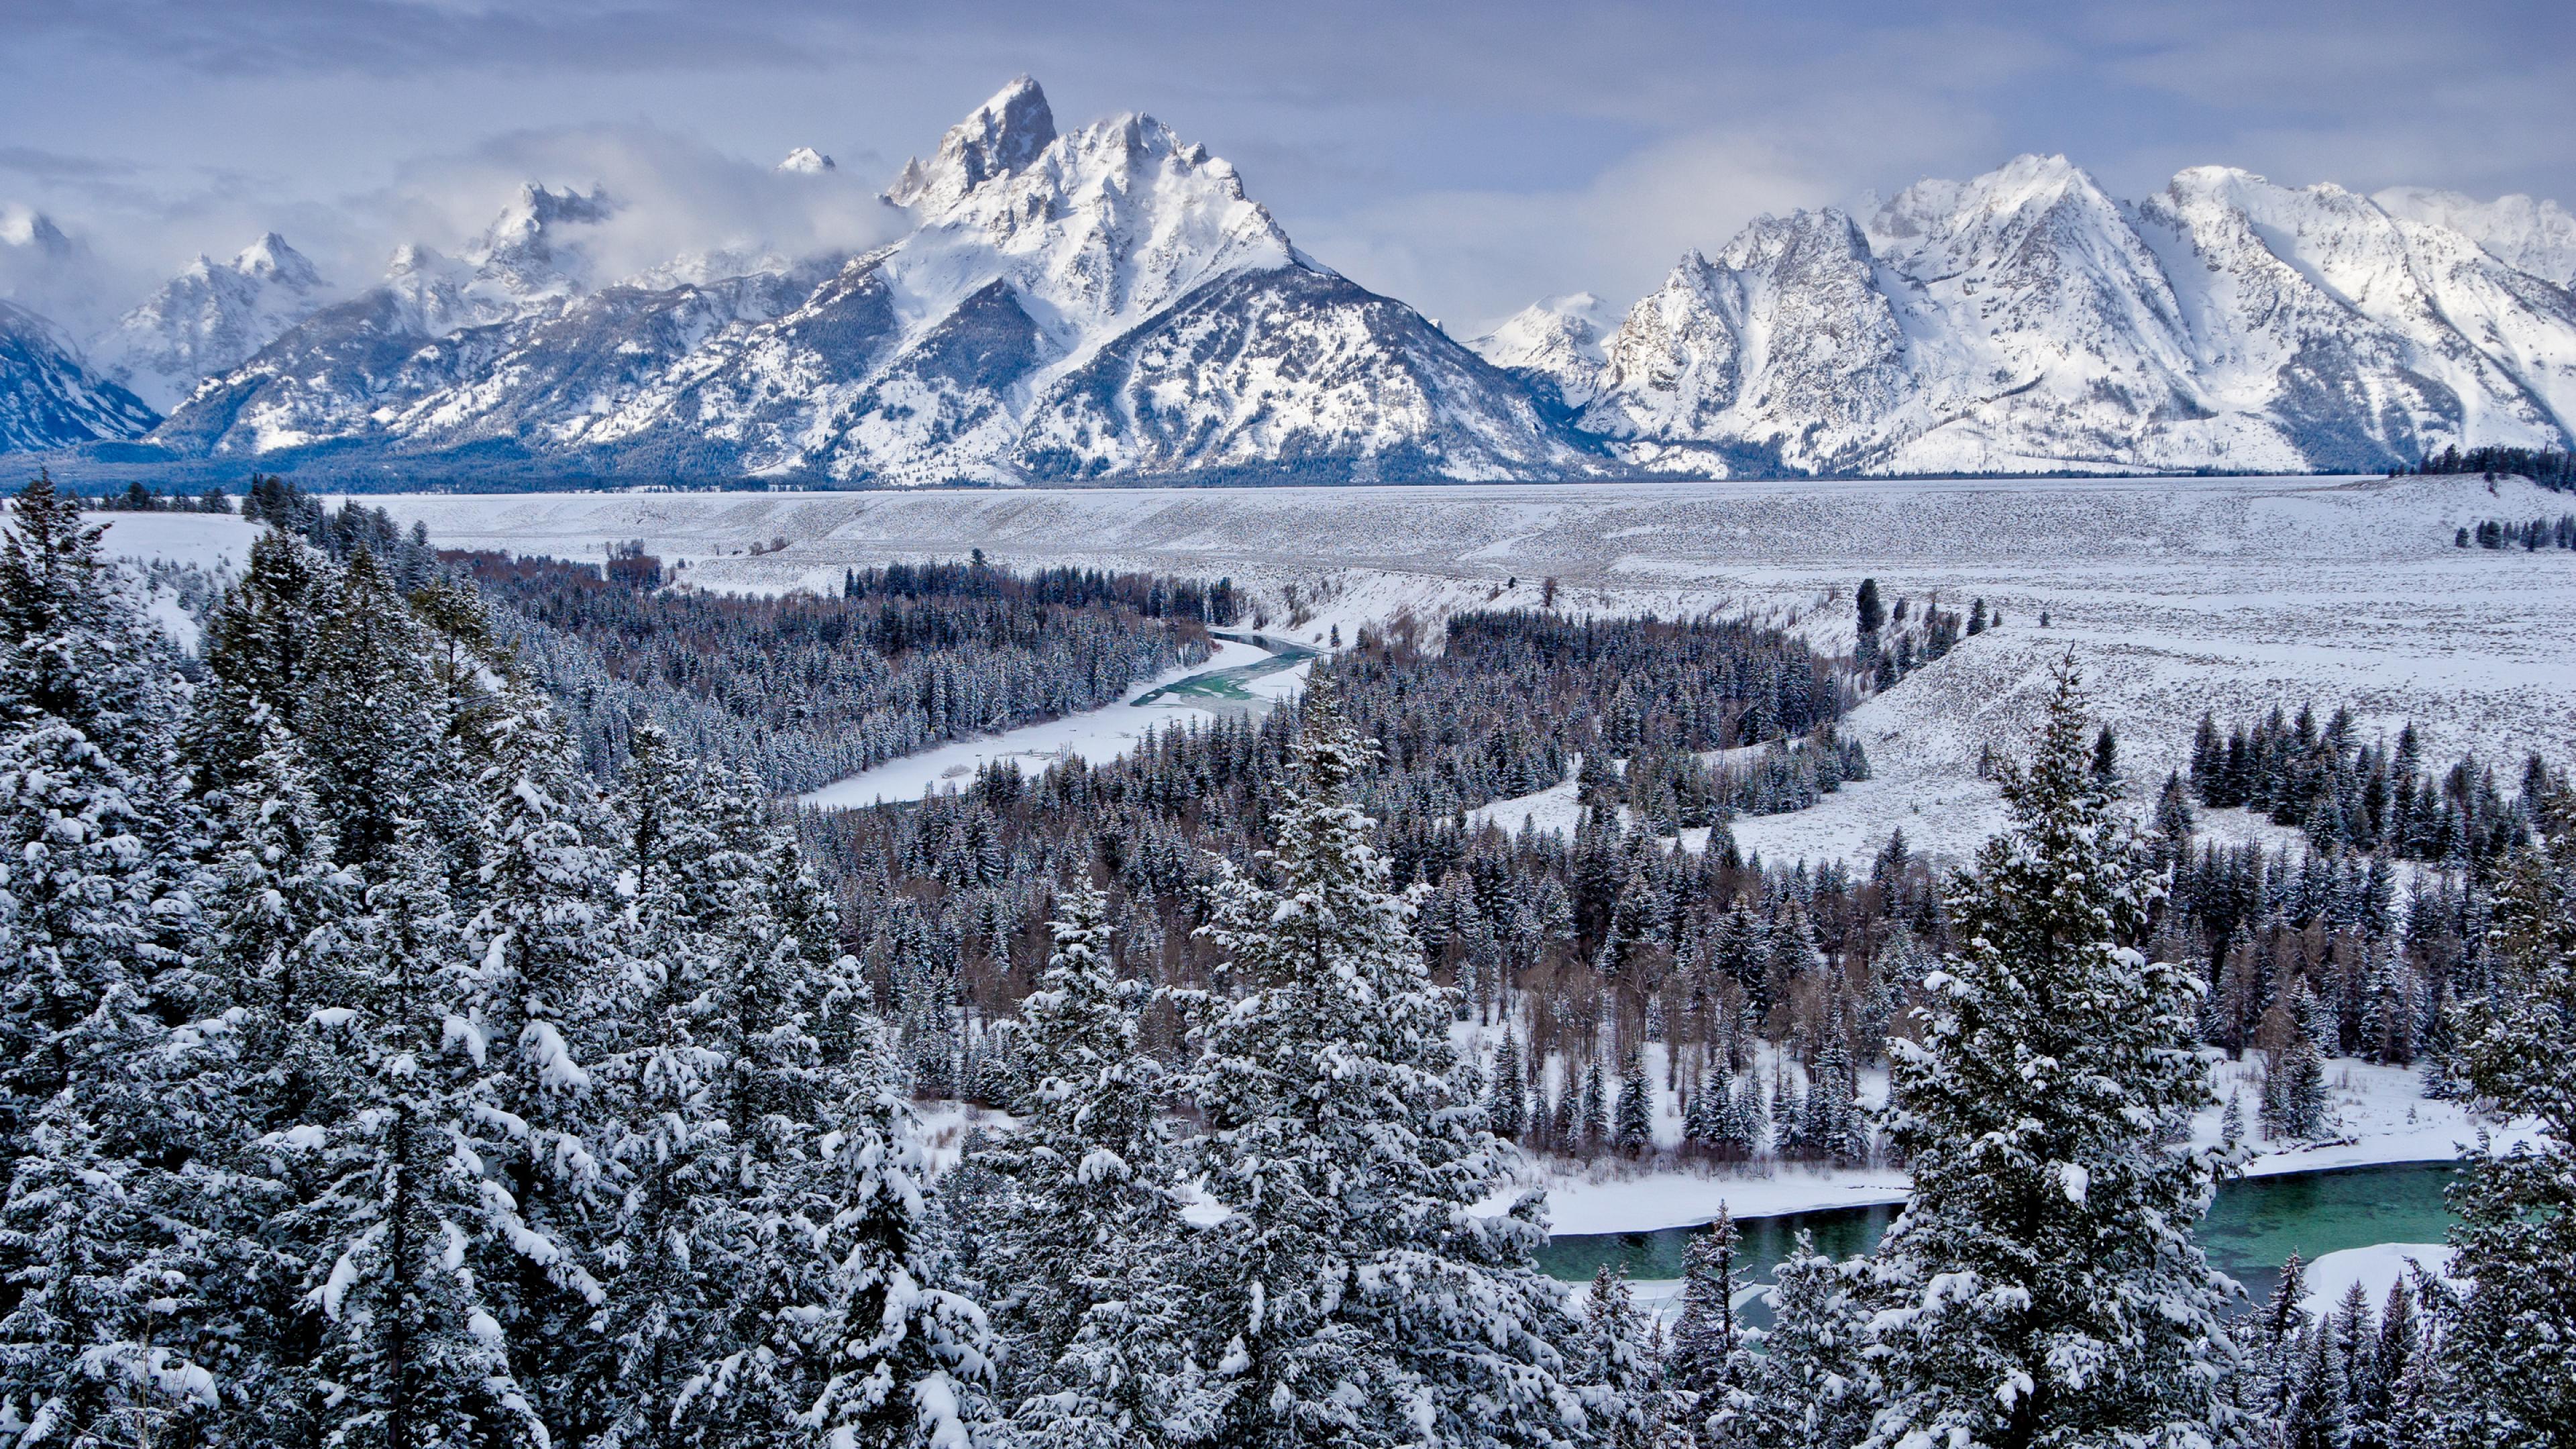 3840x2160 Grand Teton National Park United States Mountains 4k